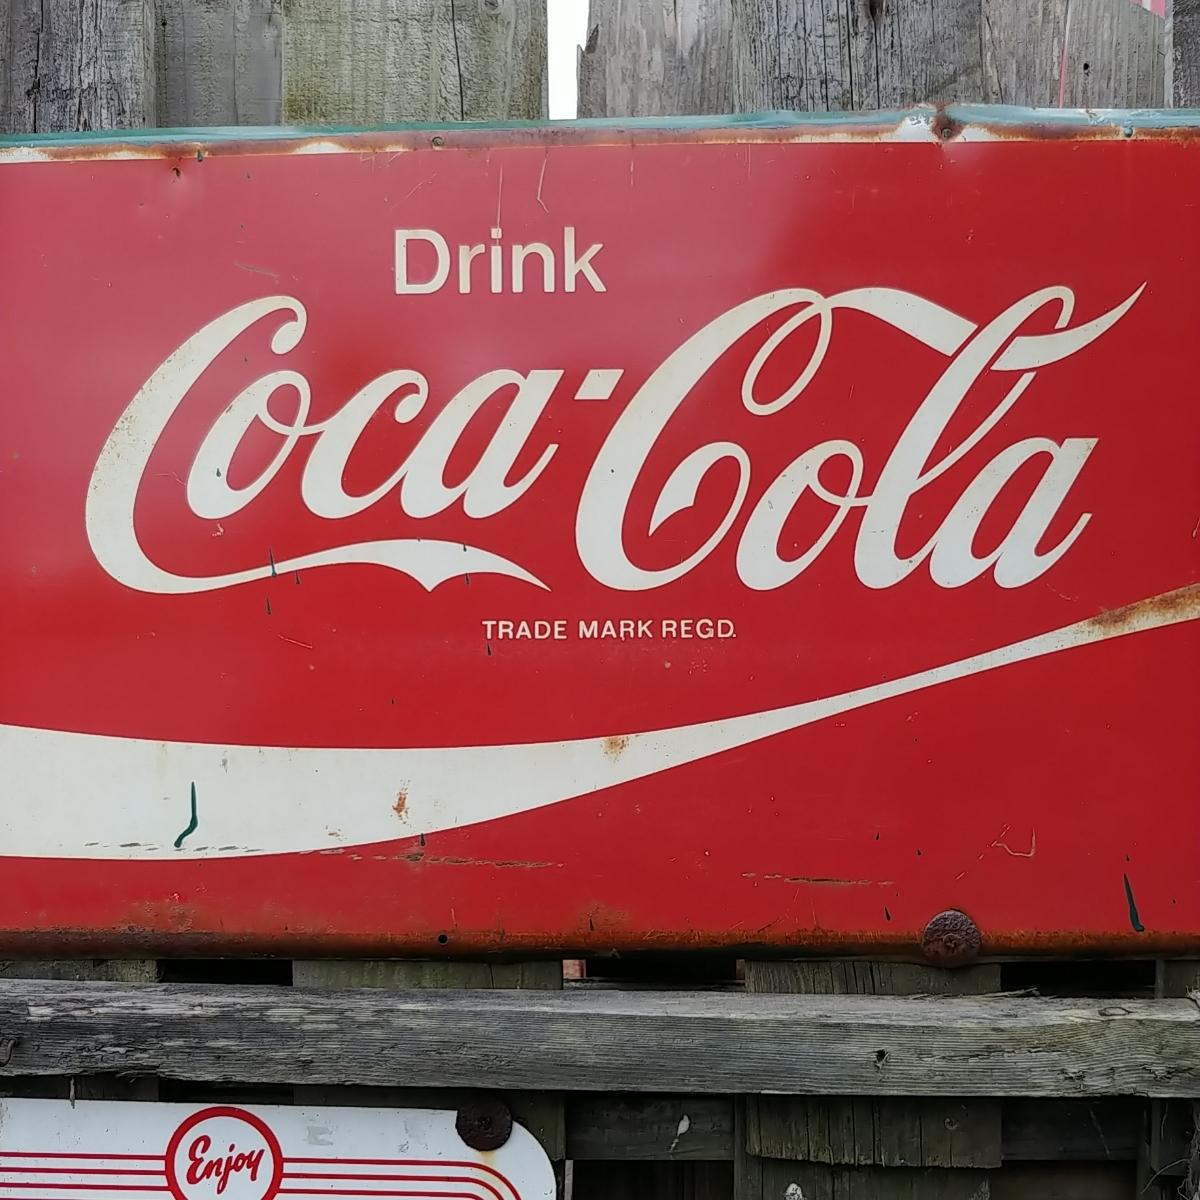 ☆AMERICAN VINTAGE SING☆Coca-Cola (コカ・コーラ)大型 フロント看板(非売品)#店舗什器#世田谷ベース #ガレージライフ_画像4